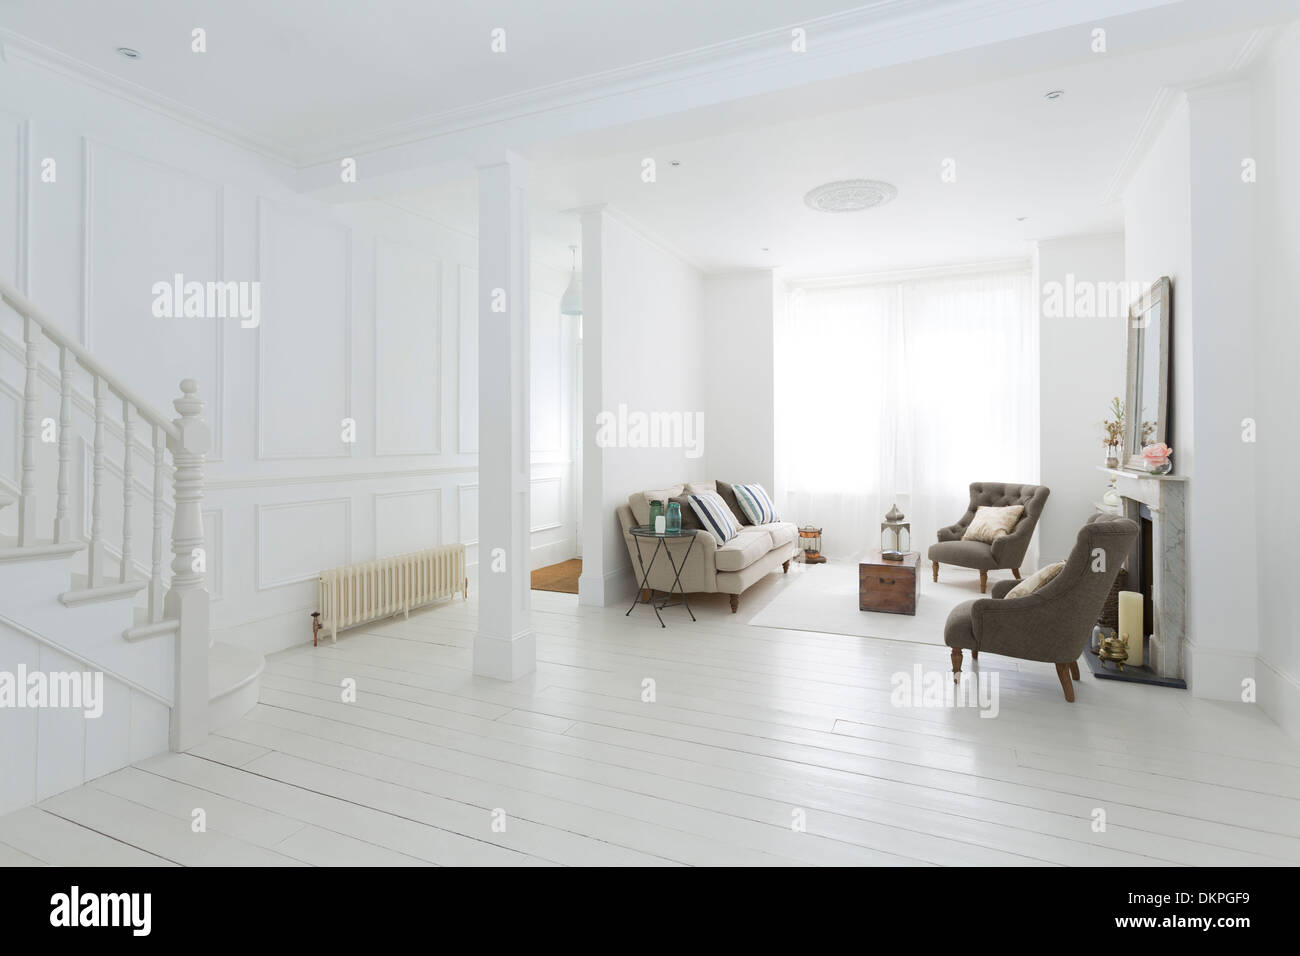 Interior Living Room Fireplace Stair Stock Photos & Interior Living ...